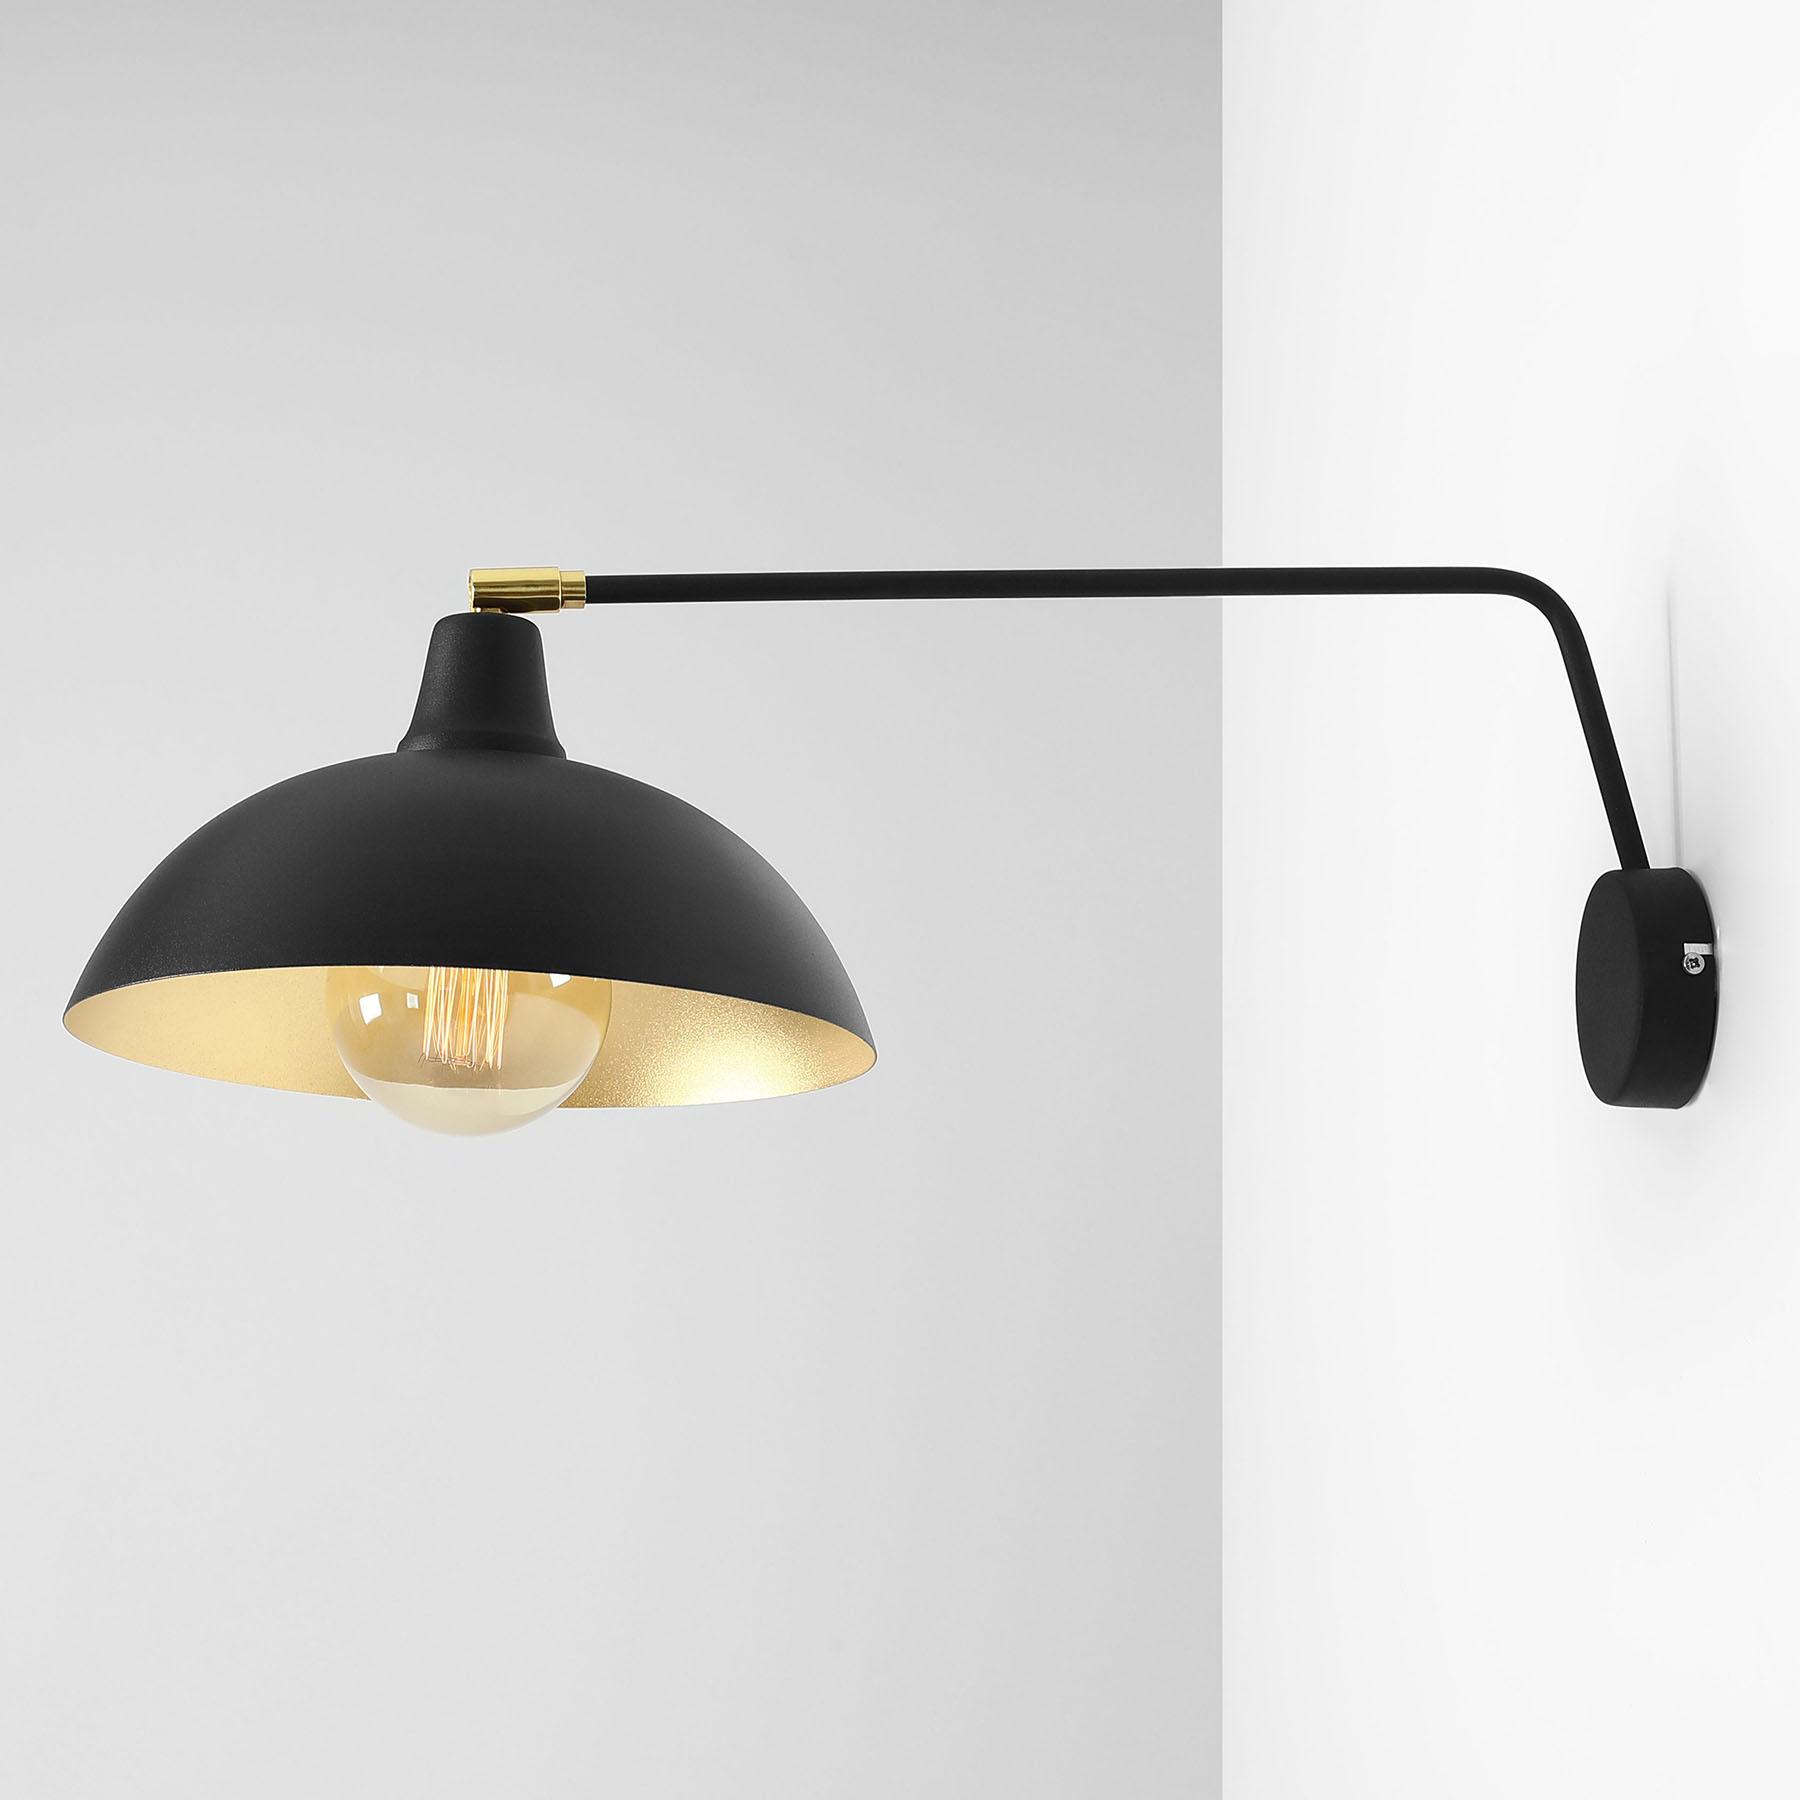 Wandlamp 1036, 1-lamp, zwart-goud